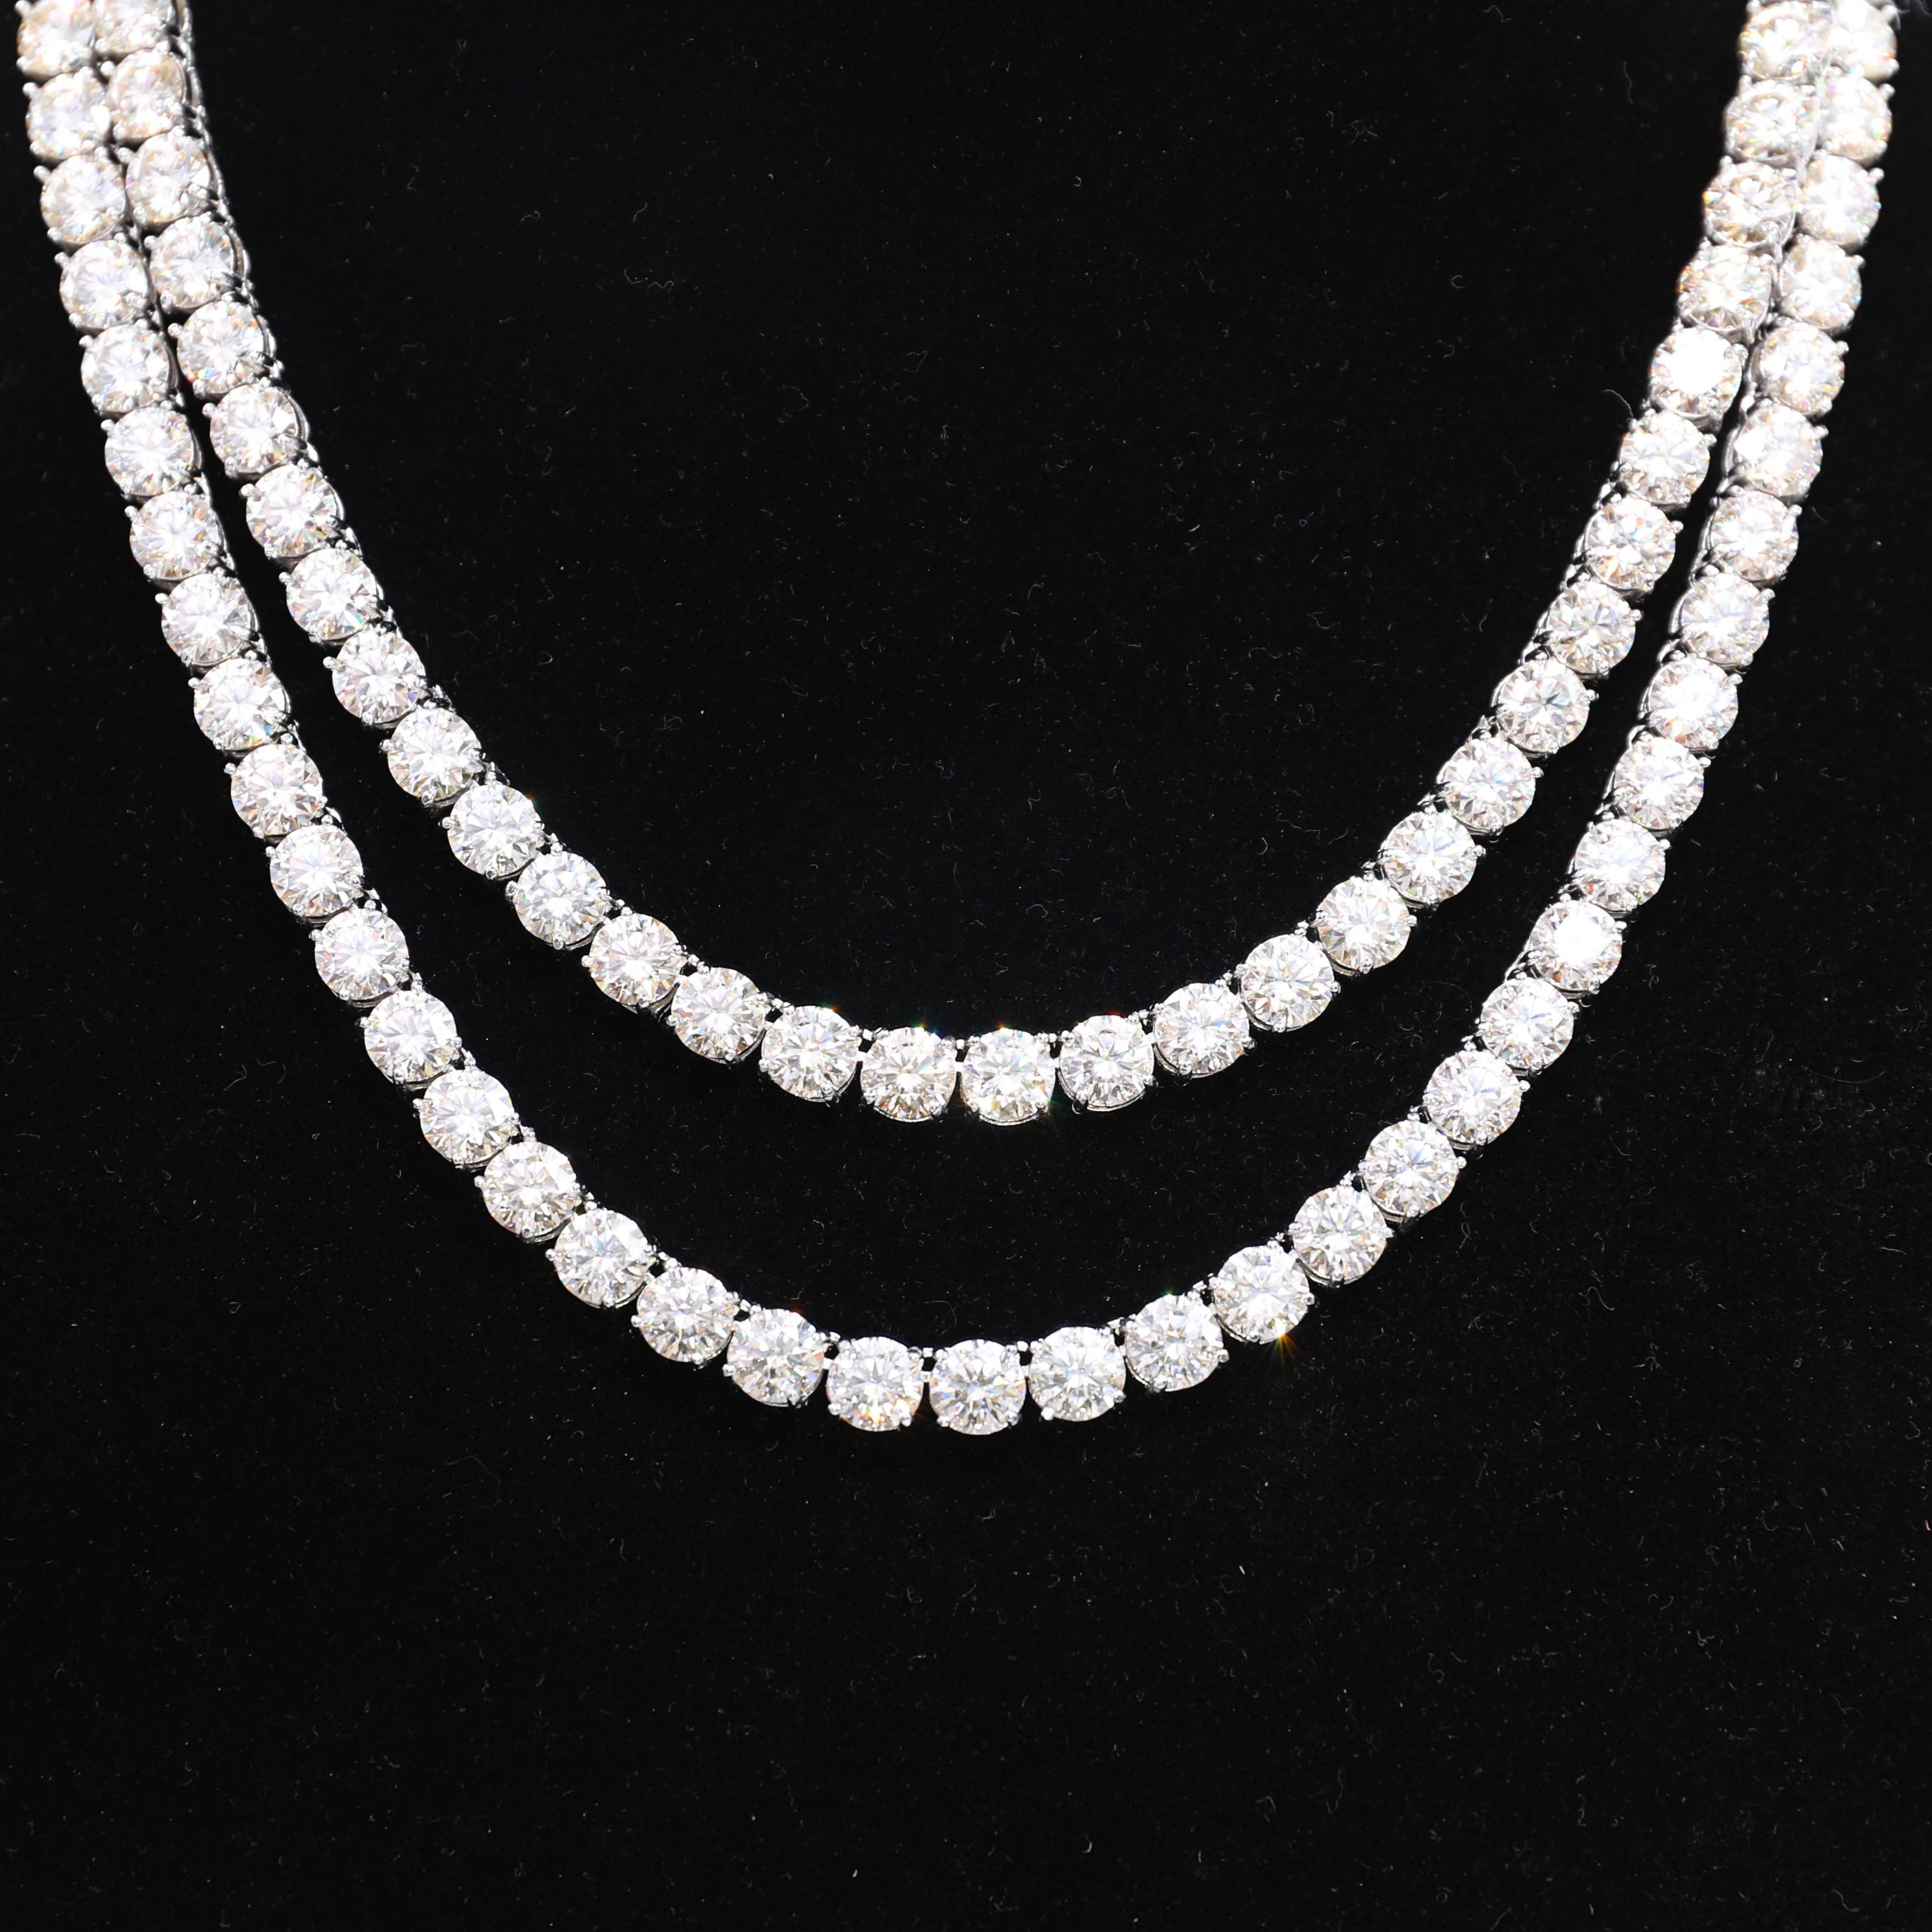 P&Y Custom S925 Sterling Silver 1 Carat 3mm 4mm 5mm Necklace Choker VVS1 Moissanite Tennis Chain For Men Women